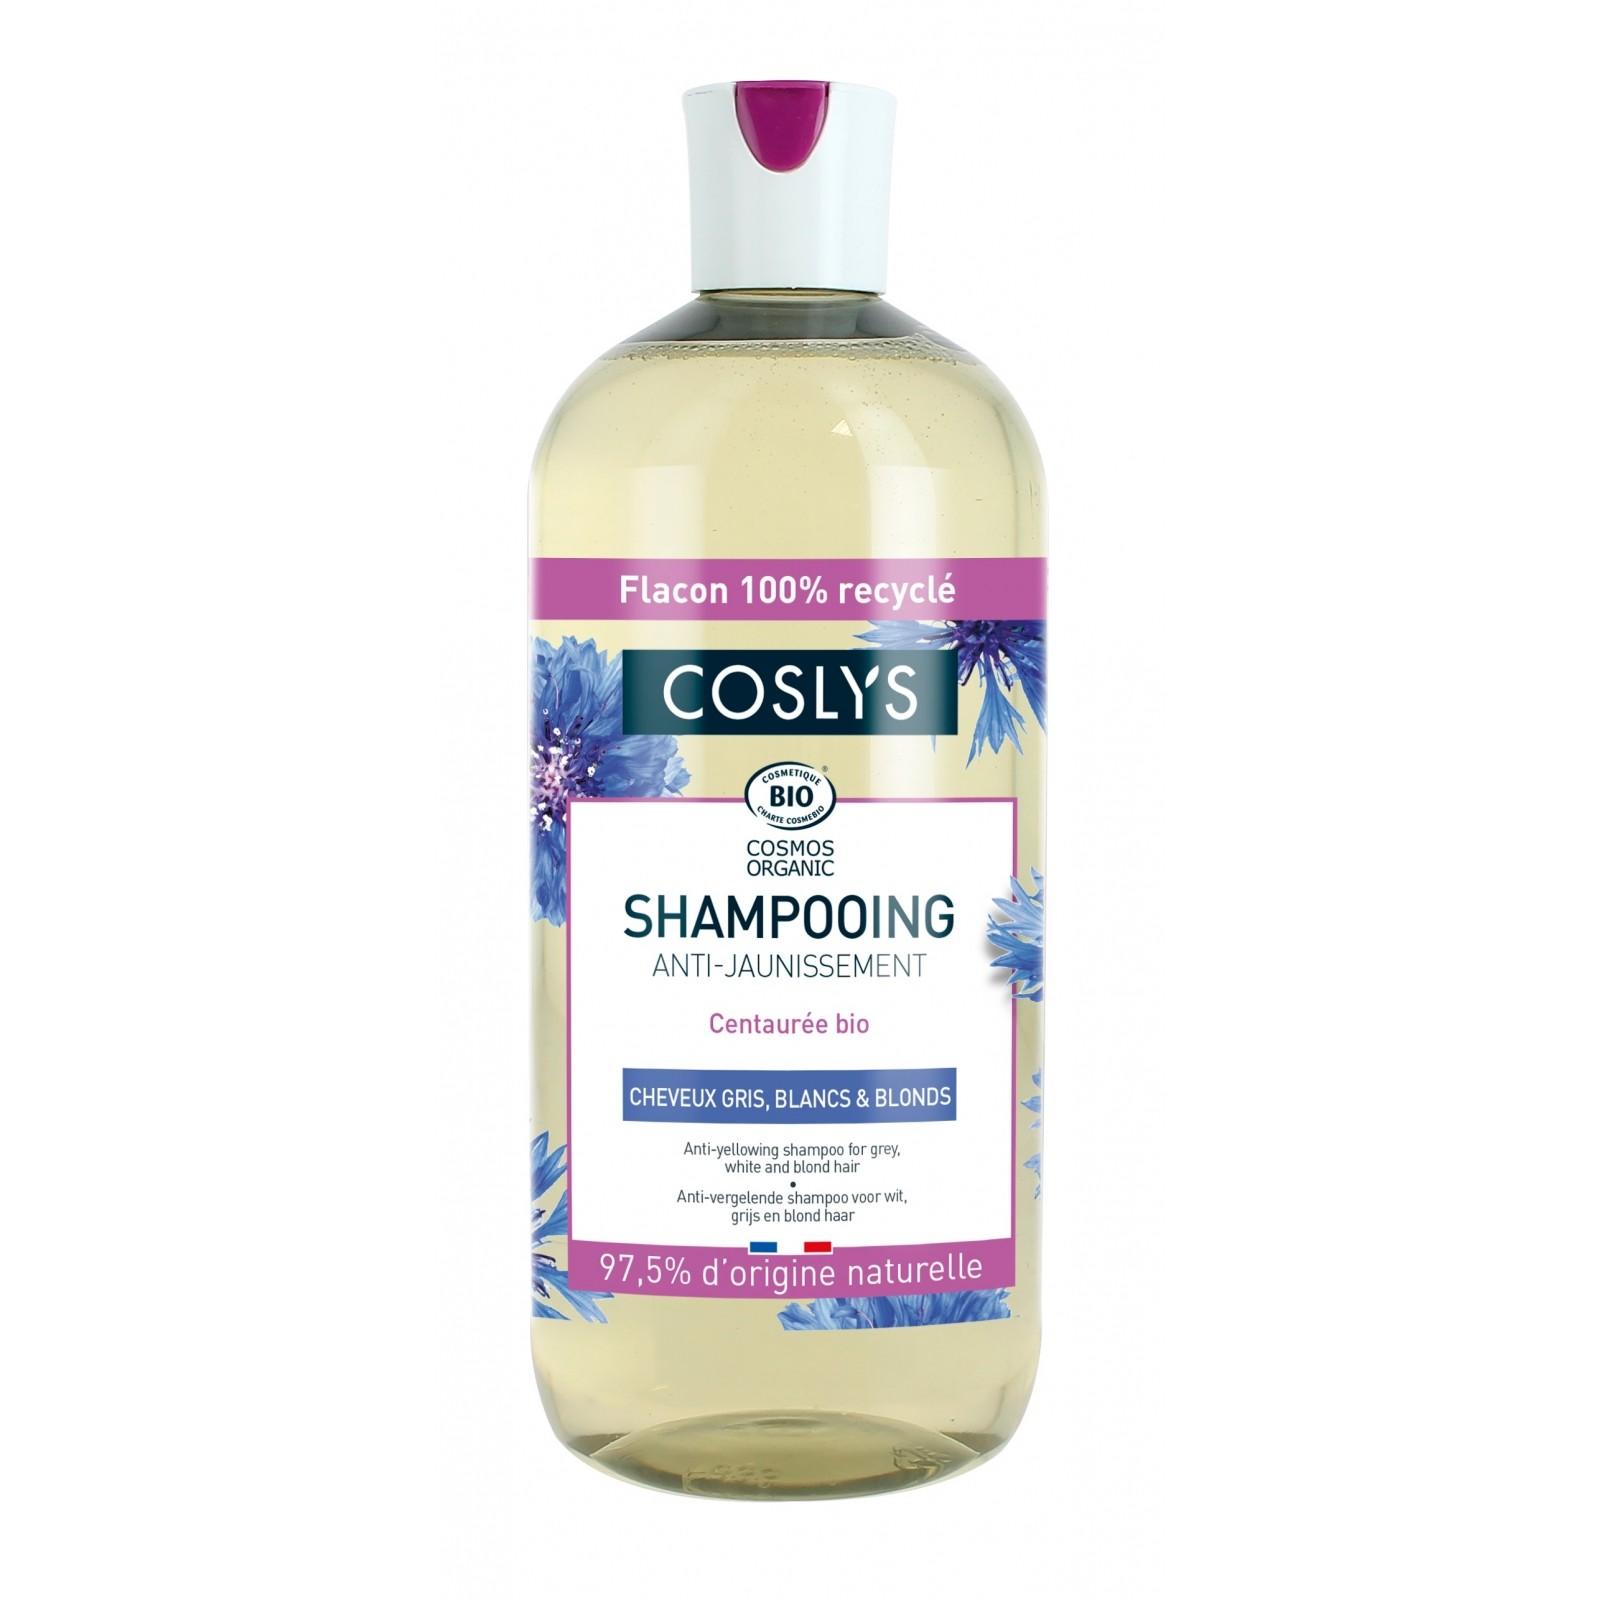 shampooing-anti-jaunissement-500-ml-coslys